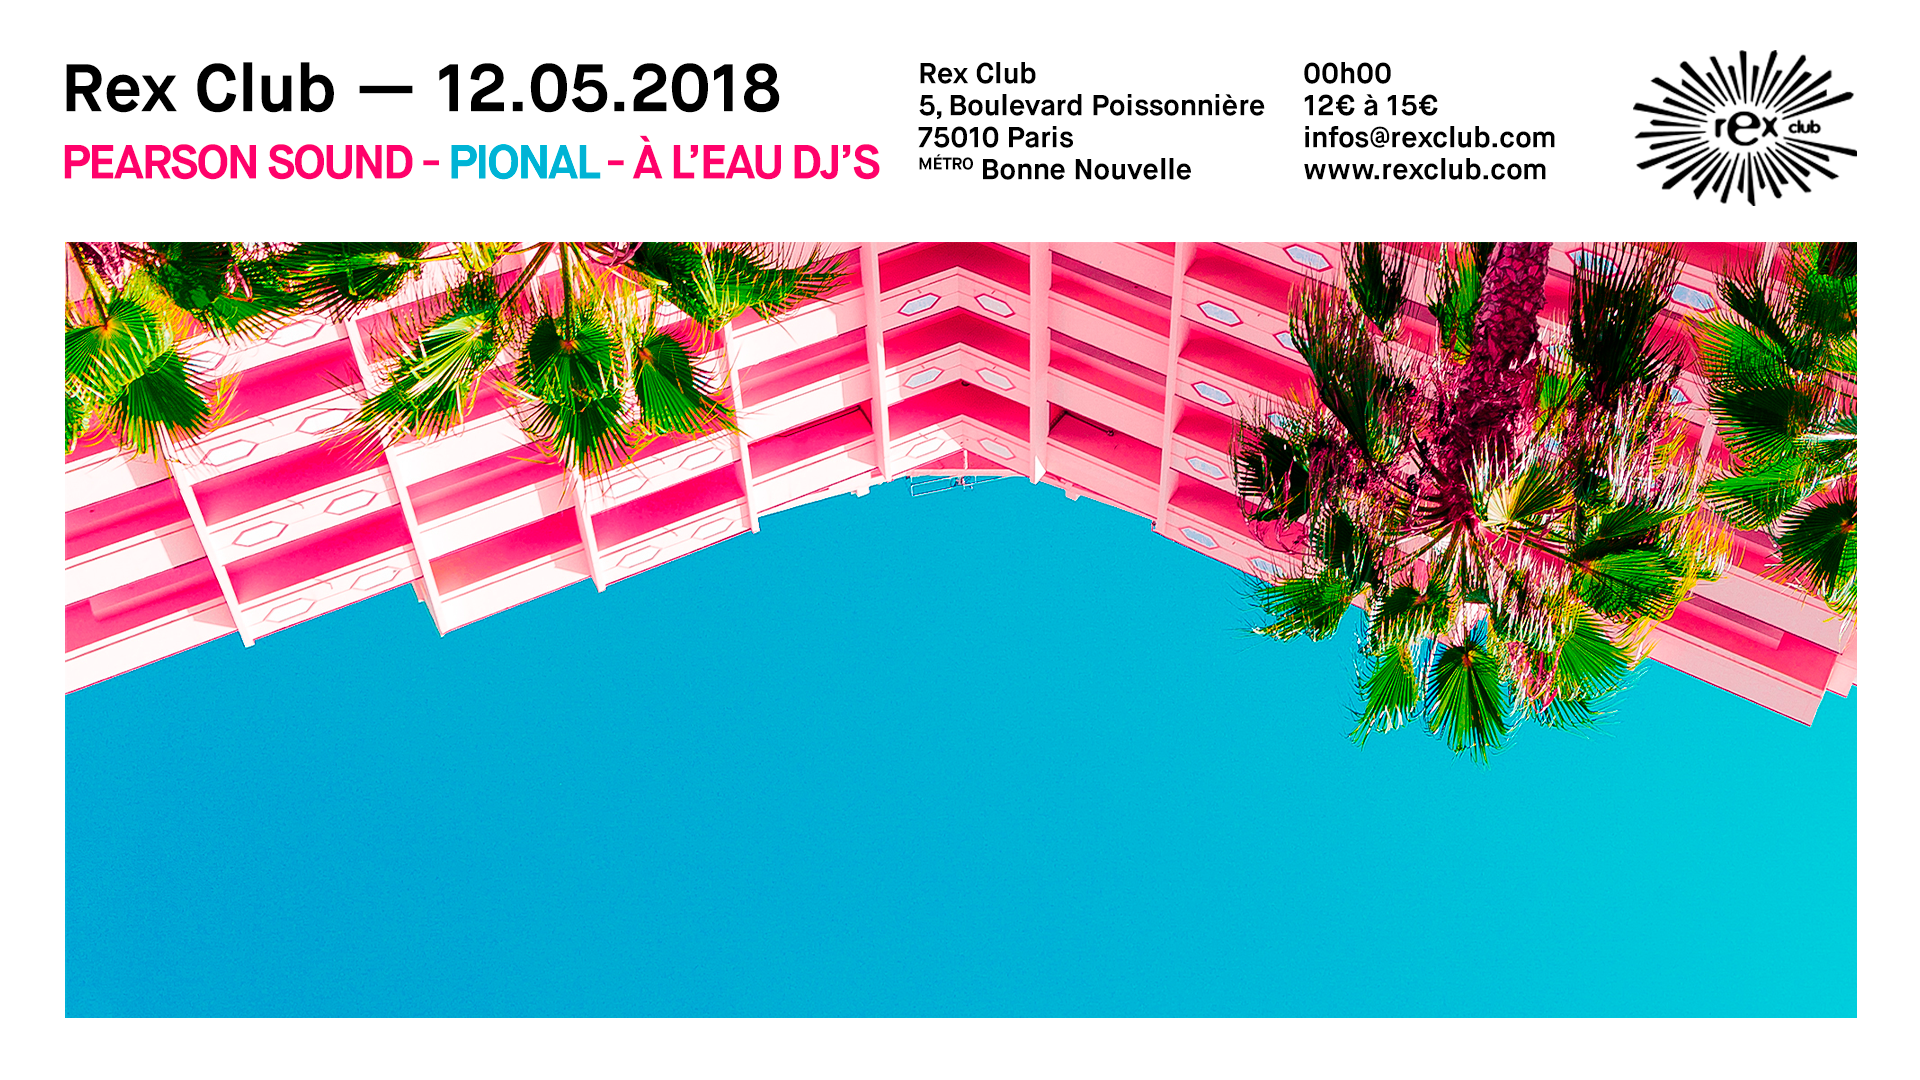 20180512_rex_club_pearson_sound_facebook_event_banner_1920x1080